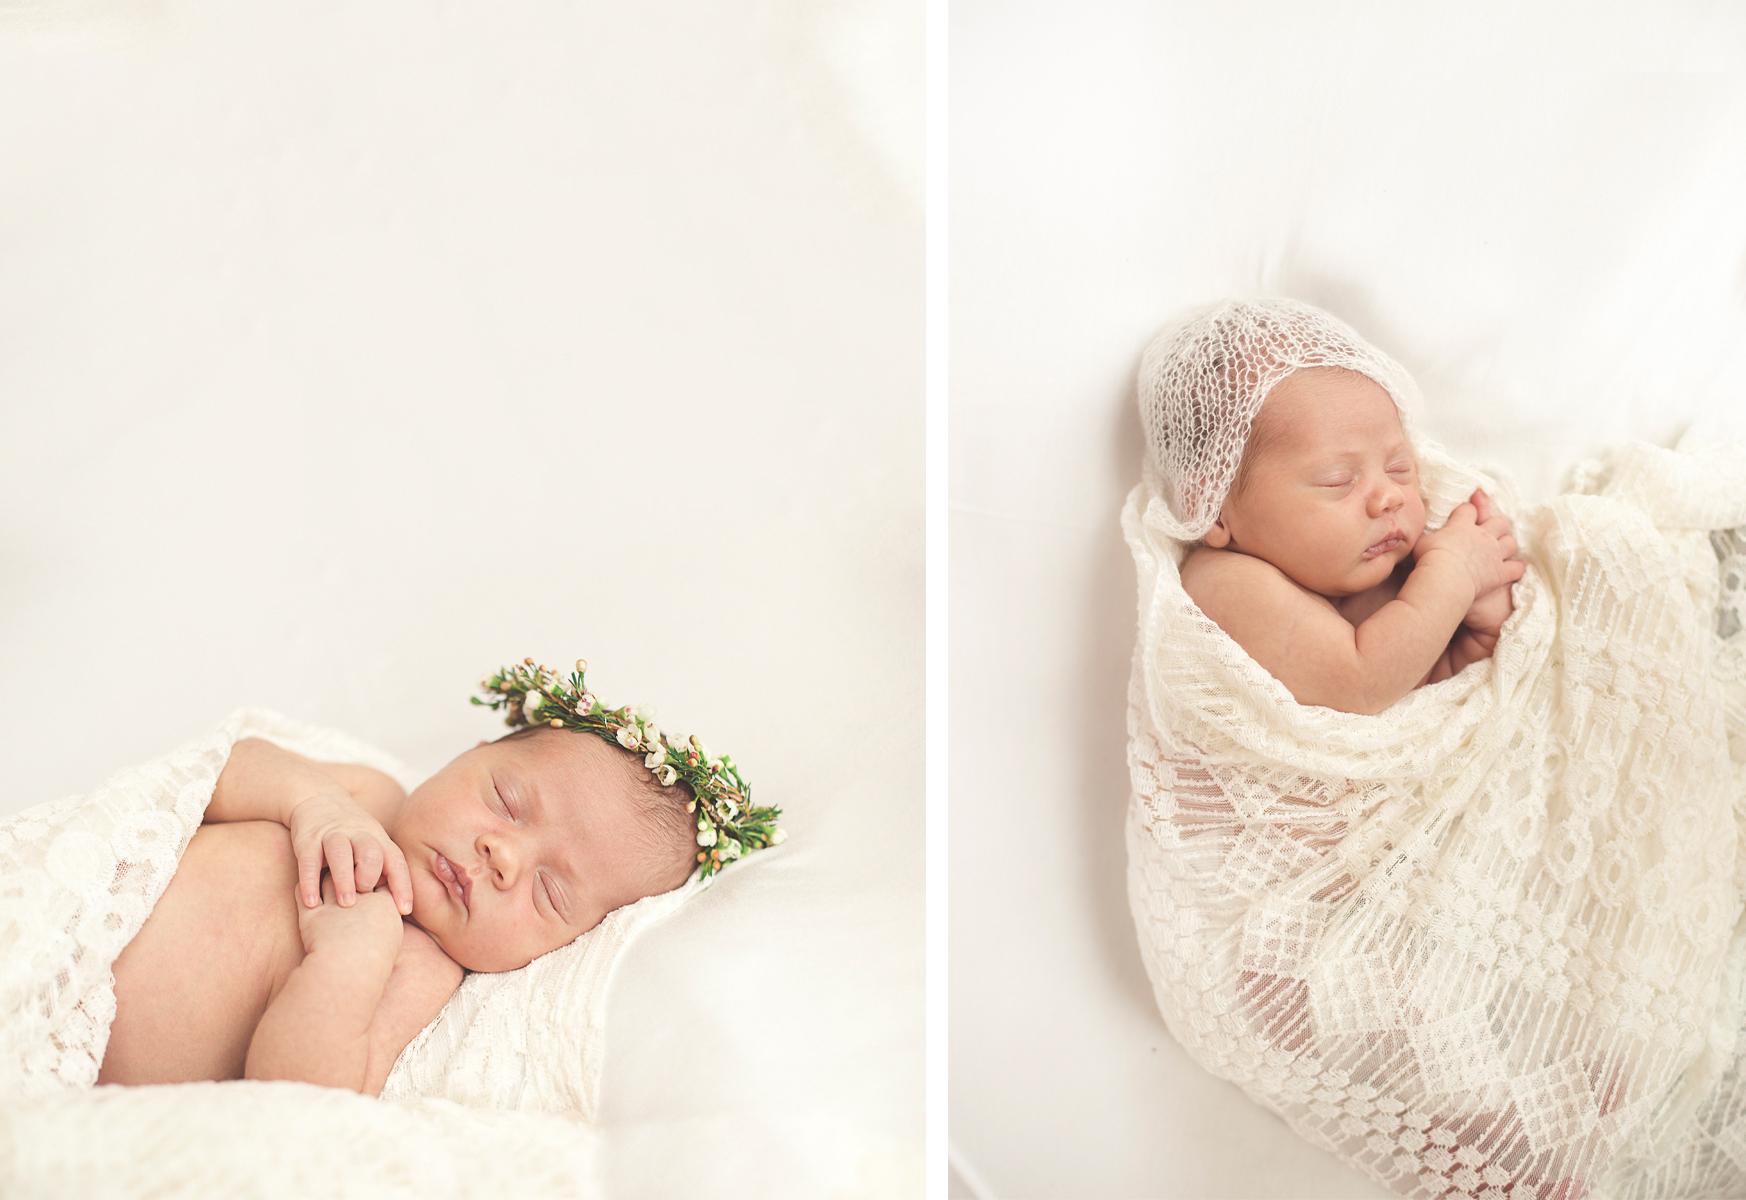 The_Woodlands_Newborn_Photographer_1.jpg